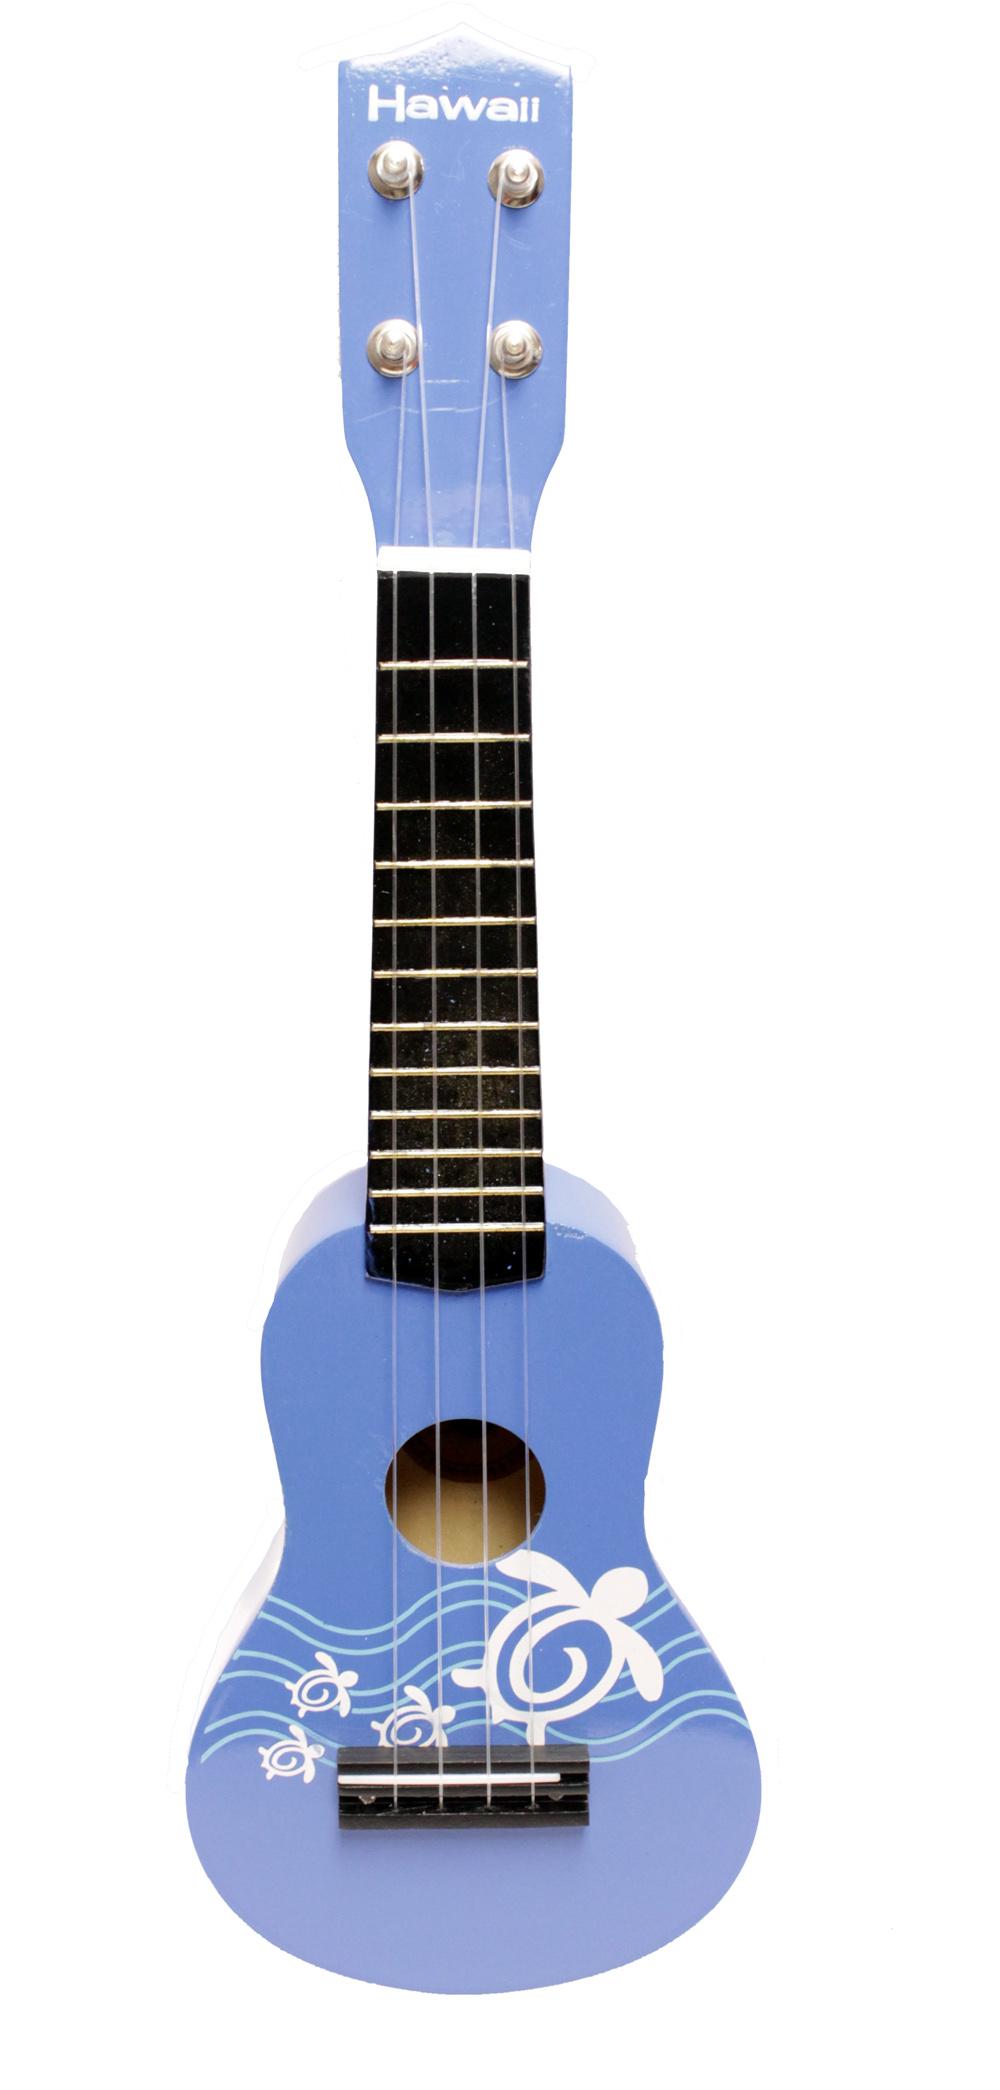 New-21-034-Hawiian-Luau-Party-Toy-Ukulele-Guitar-with-Nylon-Strings